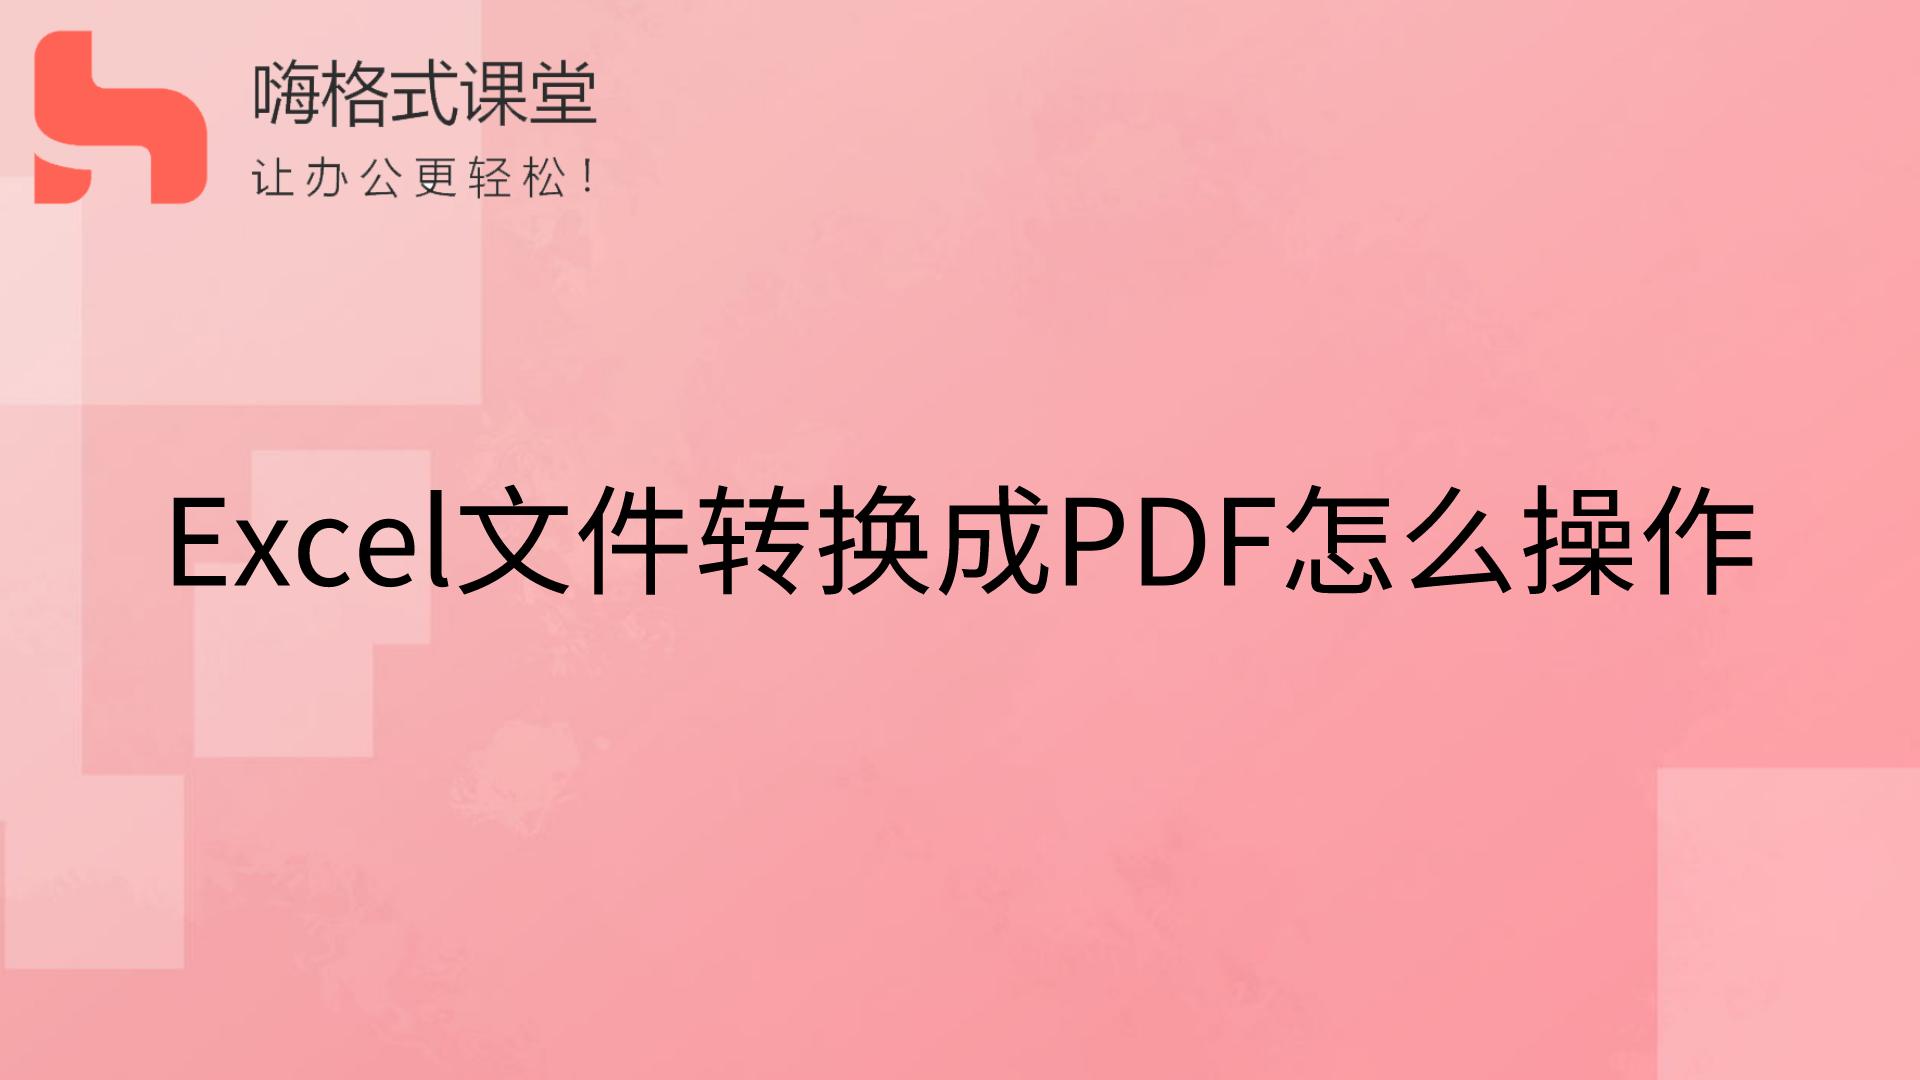 Excel文件转换成PDF怎么操作s